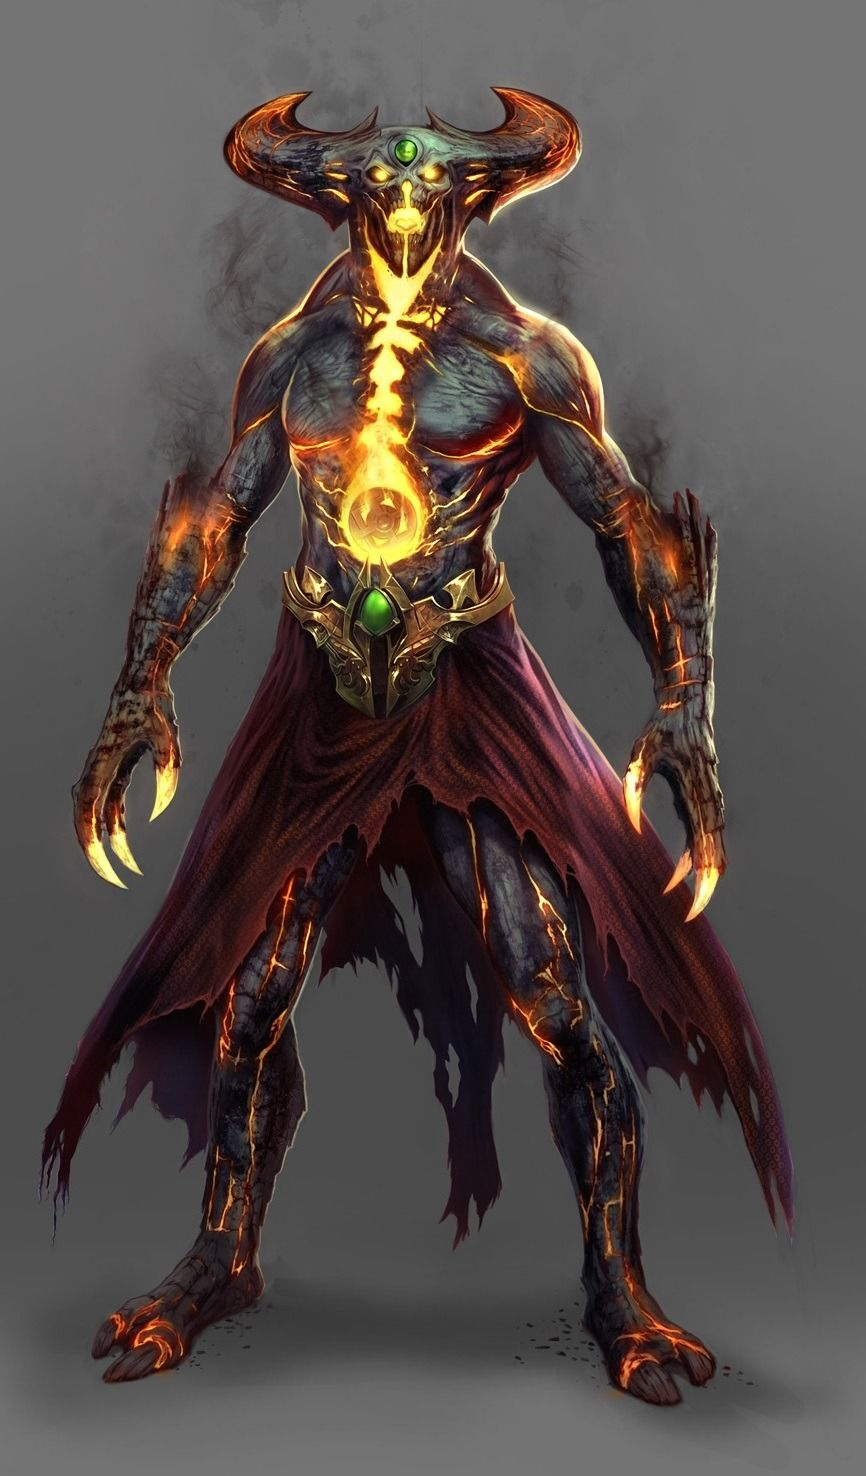 Comic Vine Mortal Kombat Art Mortal Kombat Concept Art Characters